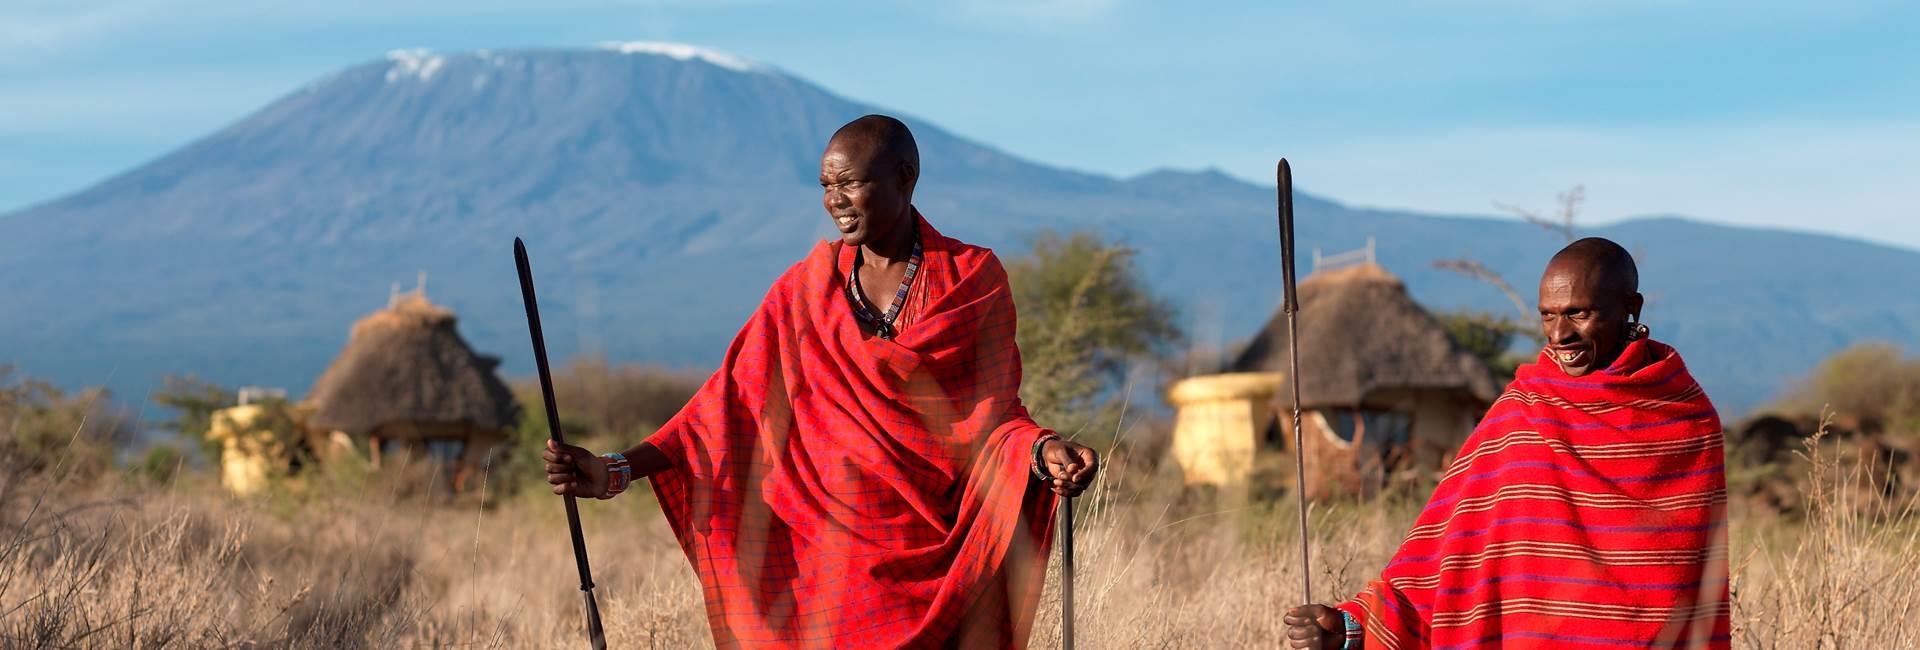 Kenia | Afrika | Live To Travel